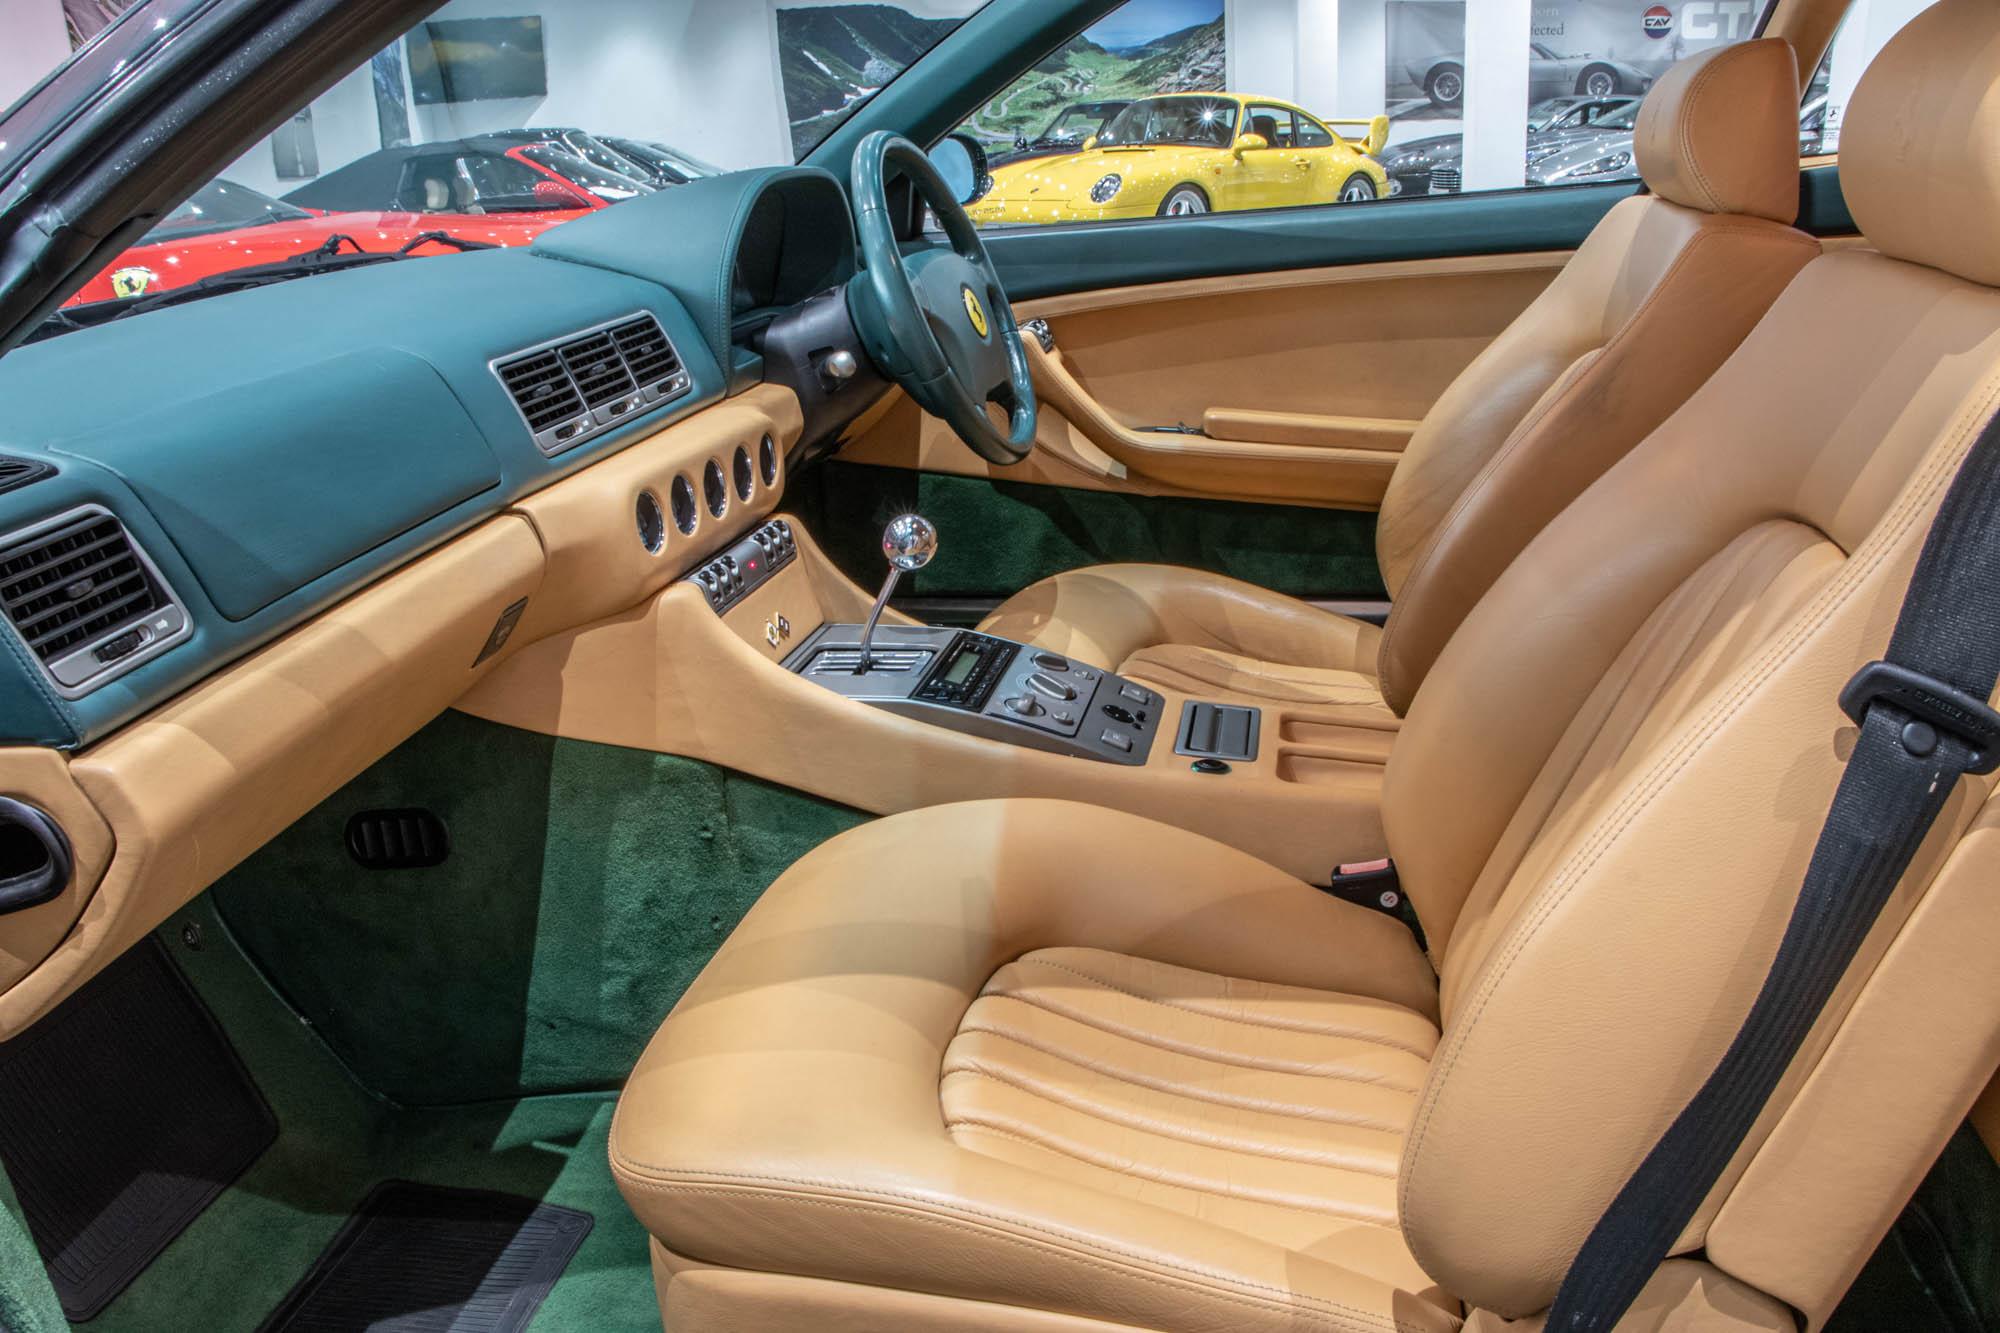 Ferrari 456 Green - Details-2